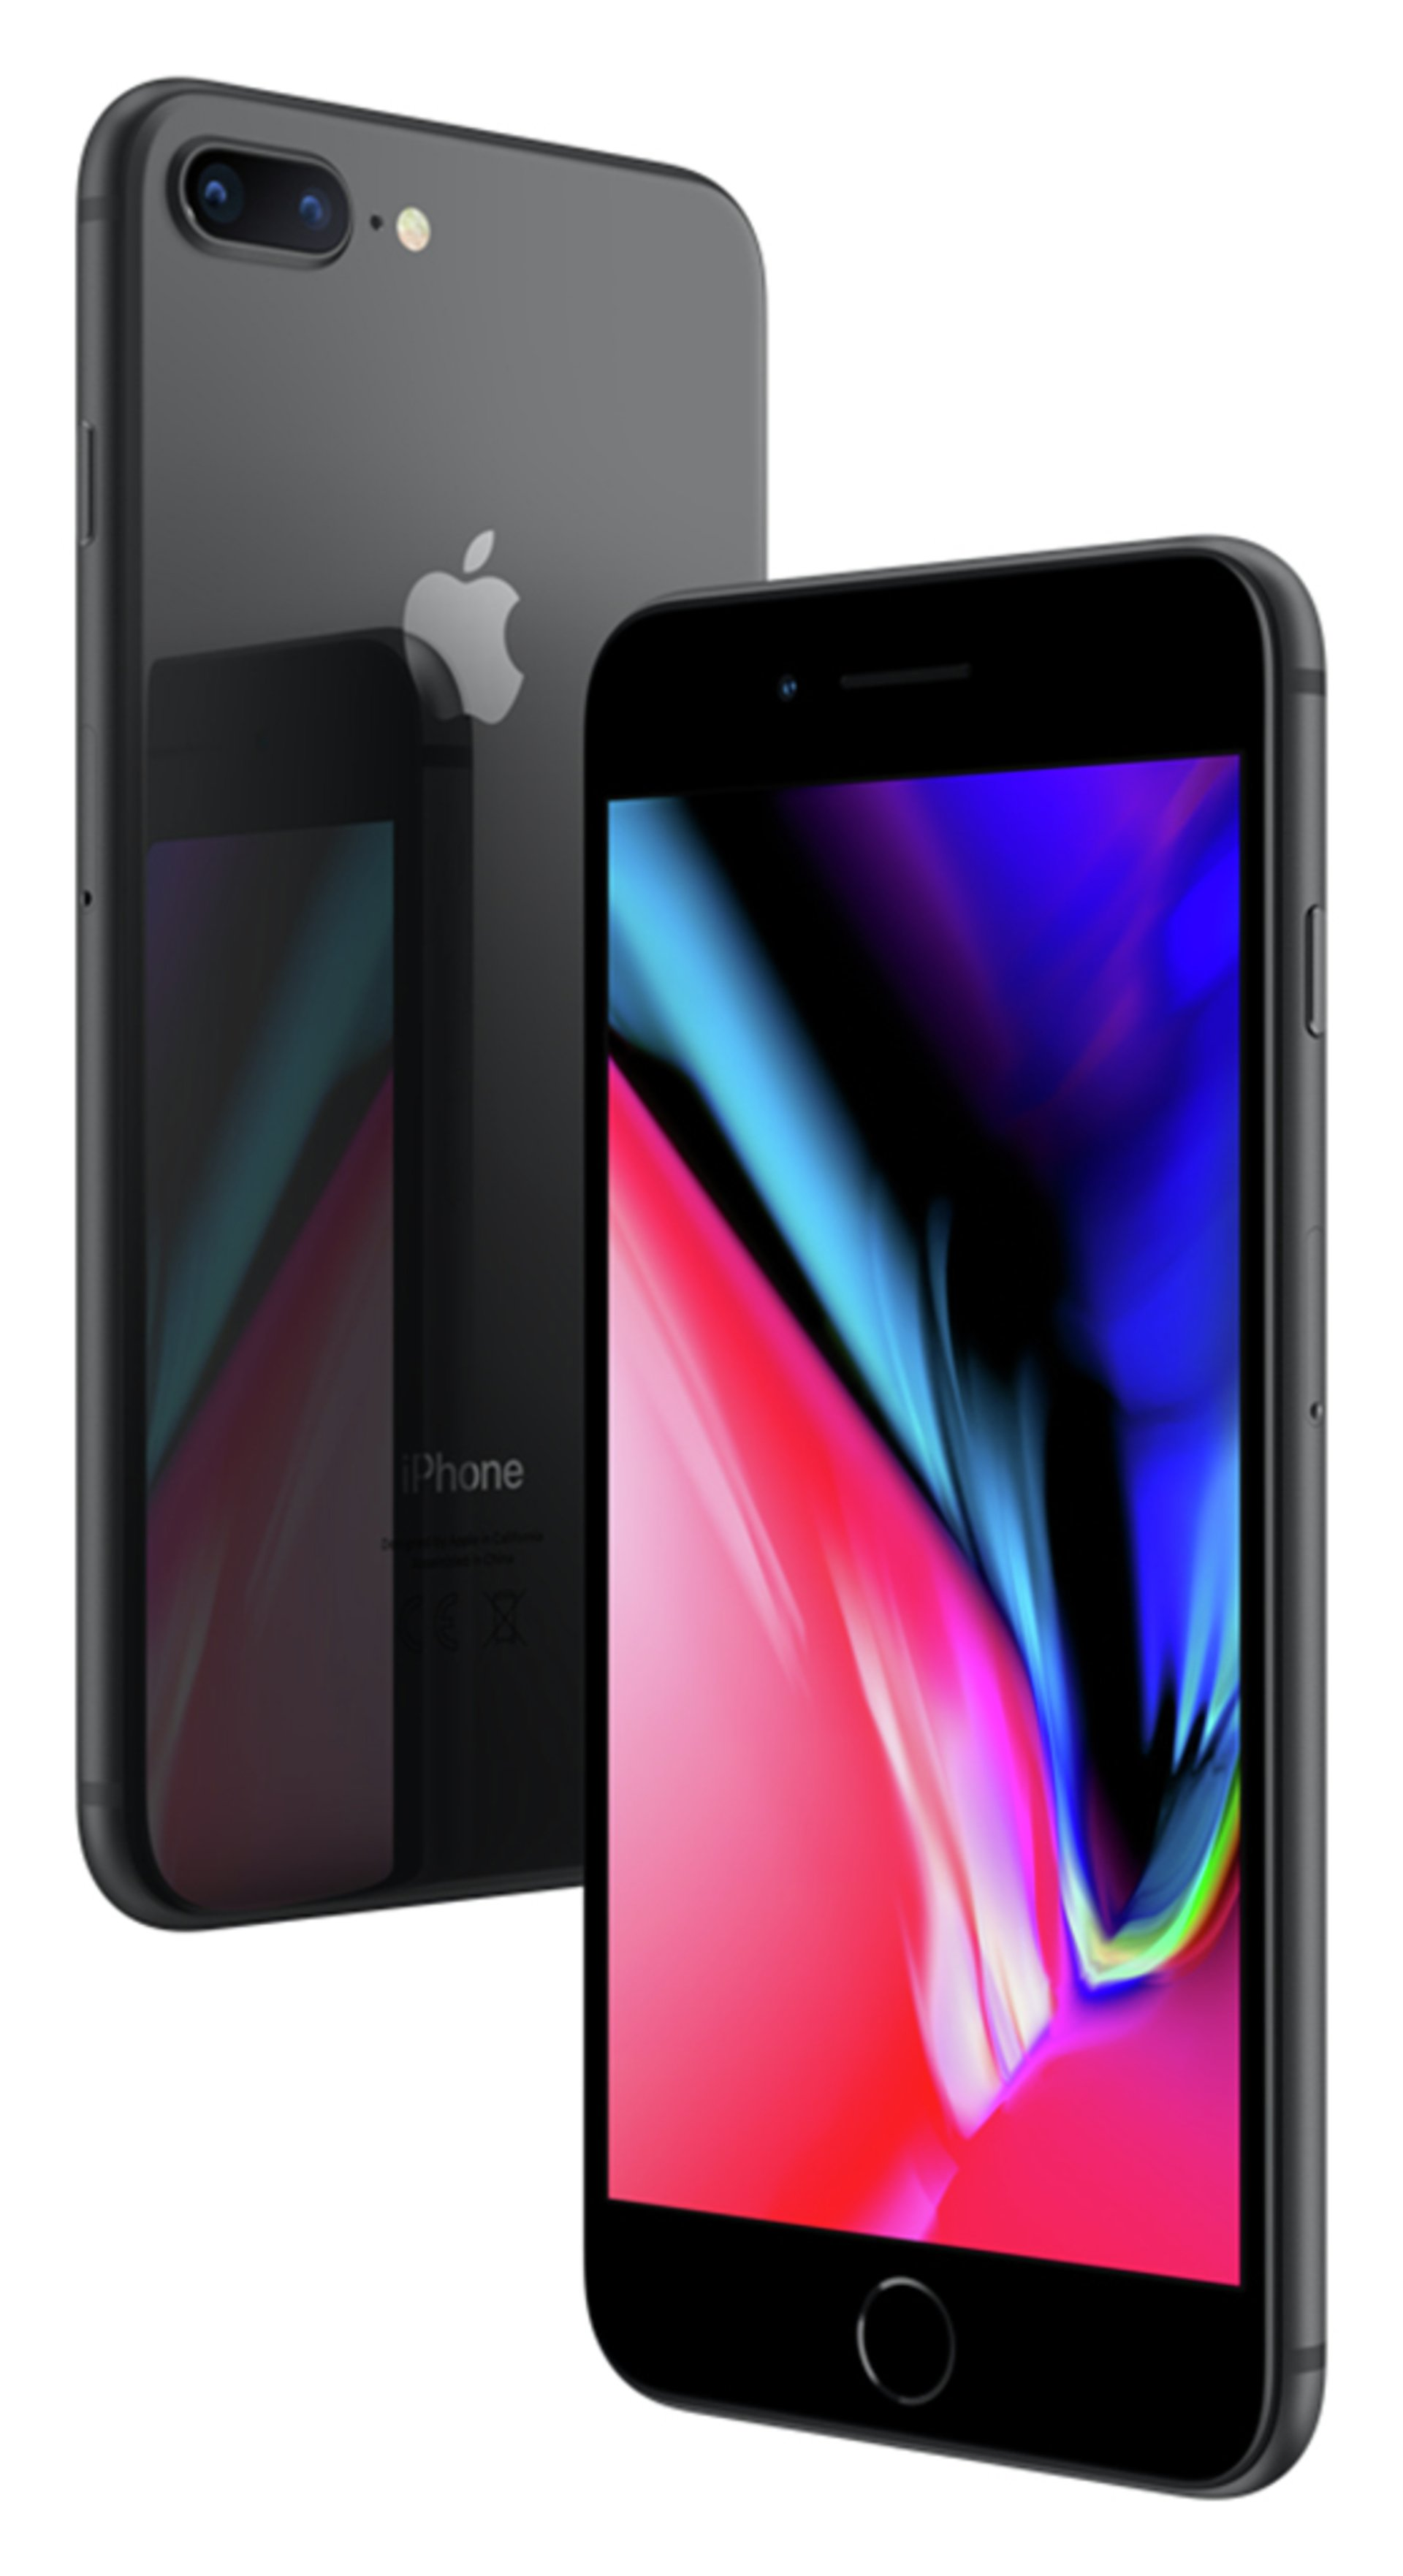 Apple Sim Free iPhone 8 Plus 64GB Mobile Phone - Space Grey